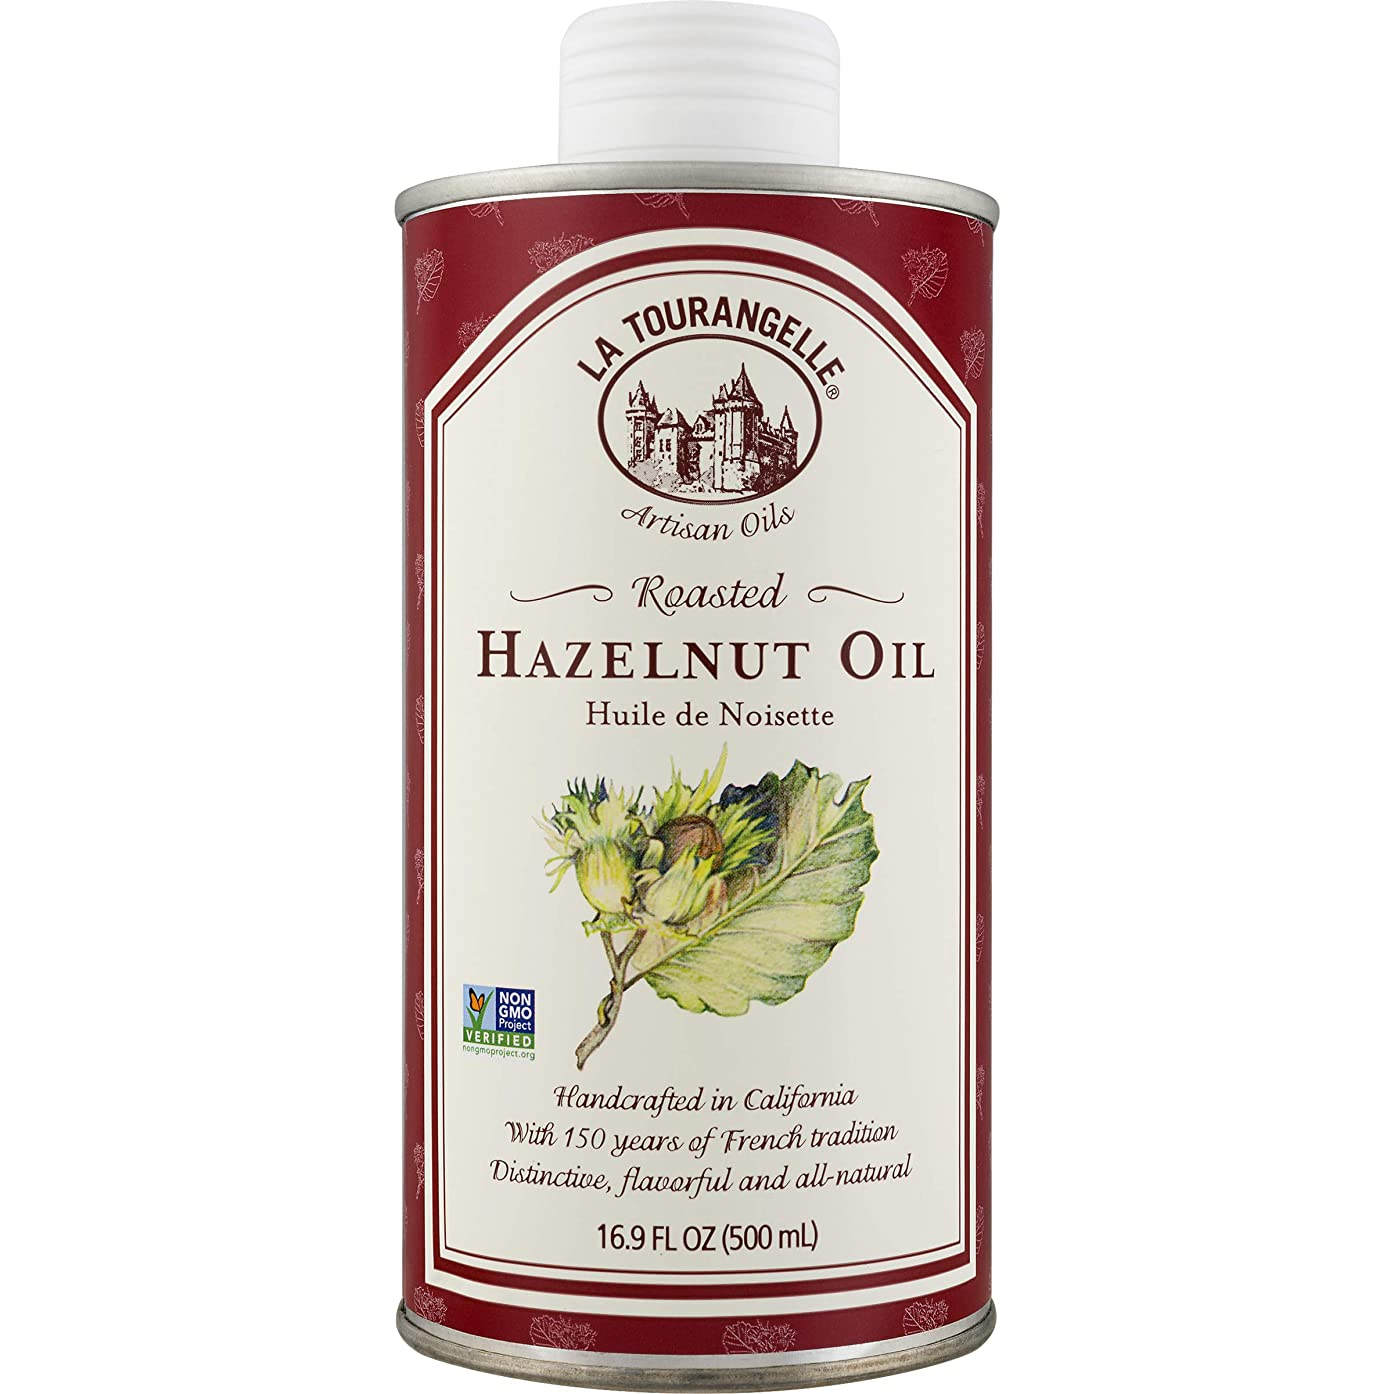 La Tourangelle Roasted Hazelnut Oil 16.9 Fl. Oz., All-Natural, Artisanal, Great for Salads, Fruit, Fish or Vegetables